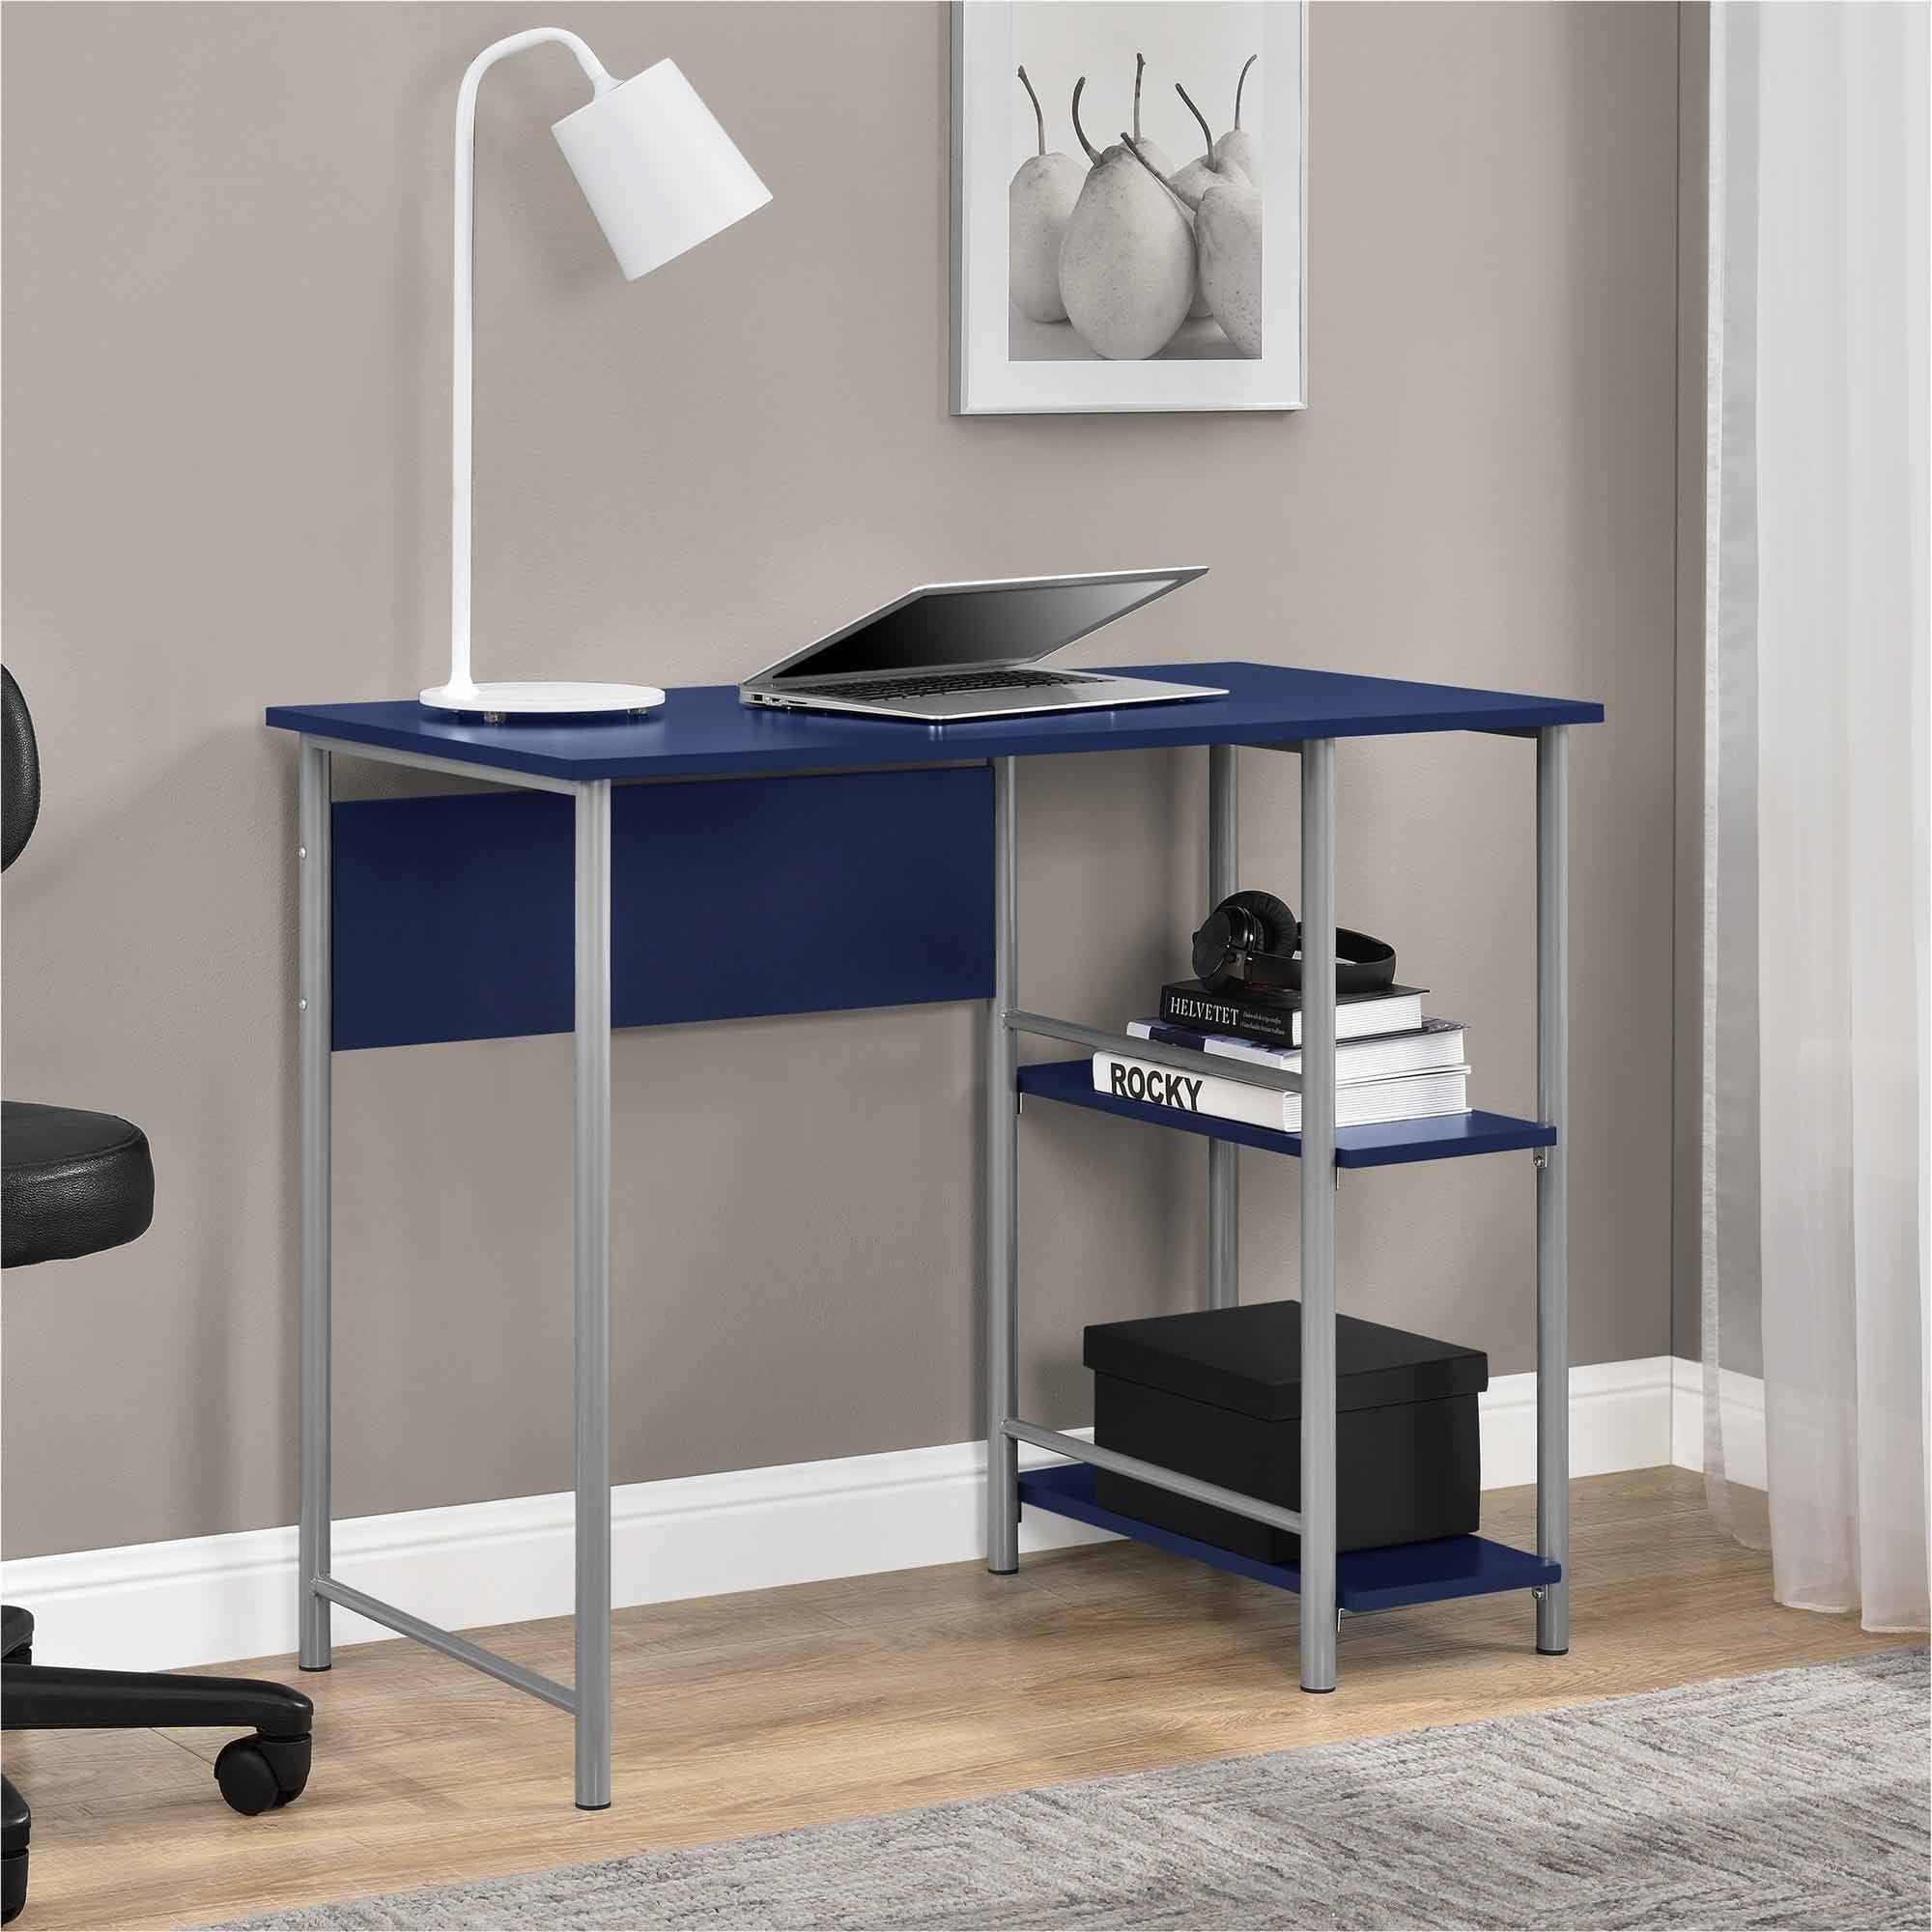 Student Desk Storage Organizer Computer Table Multiple